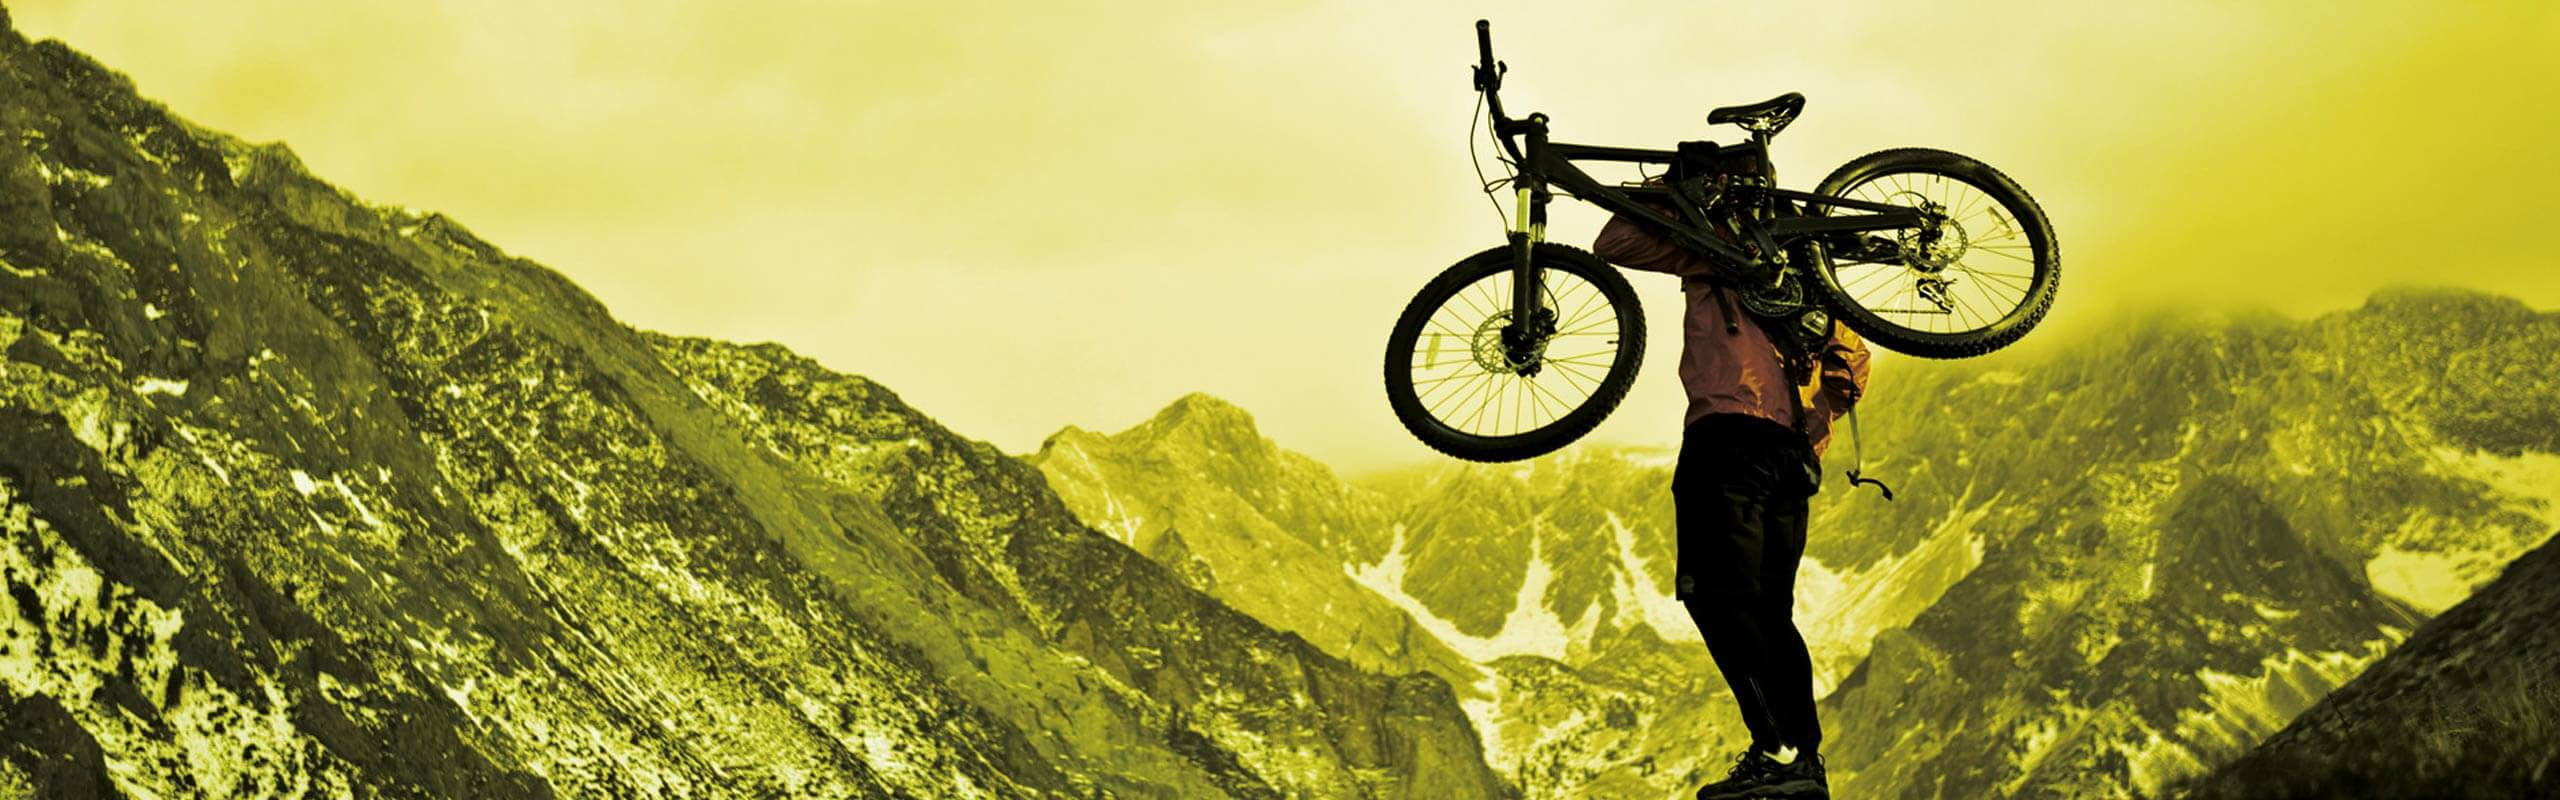 Roomers Baden-Baden Mountainbike